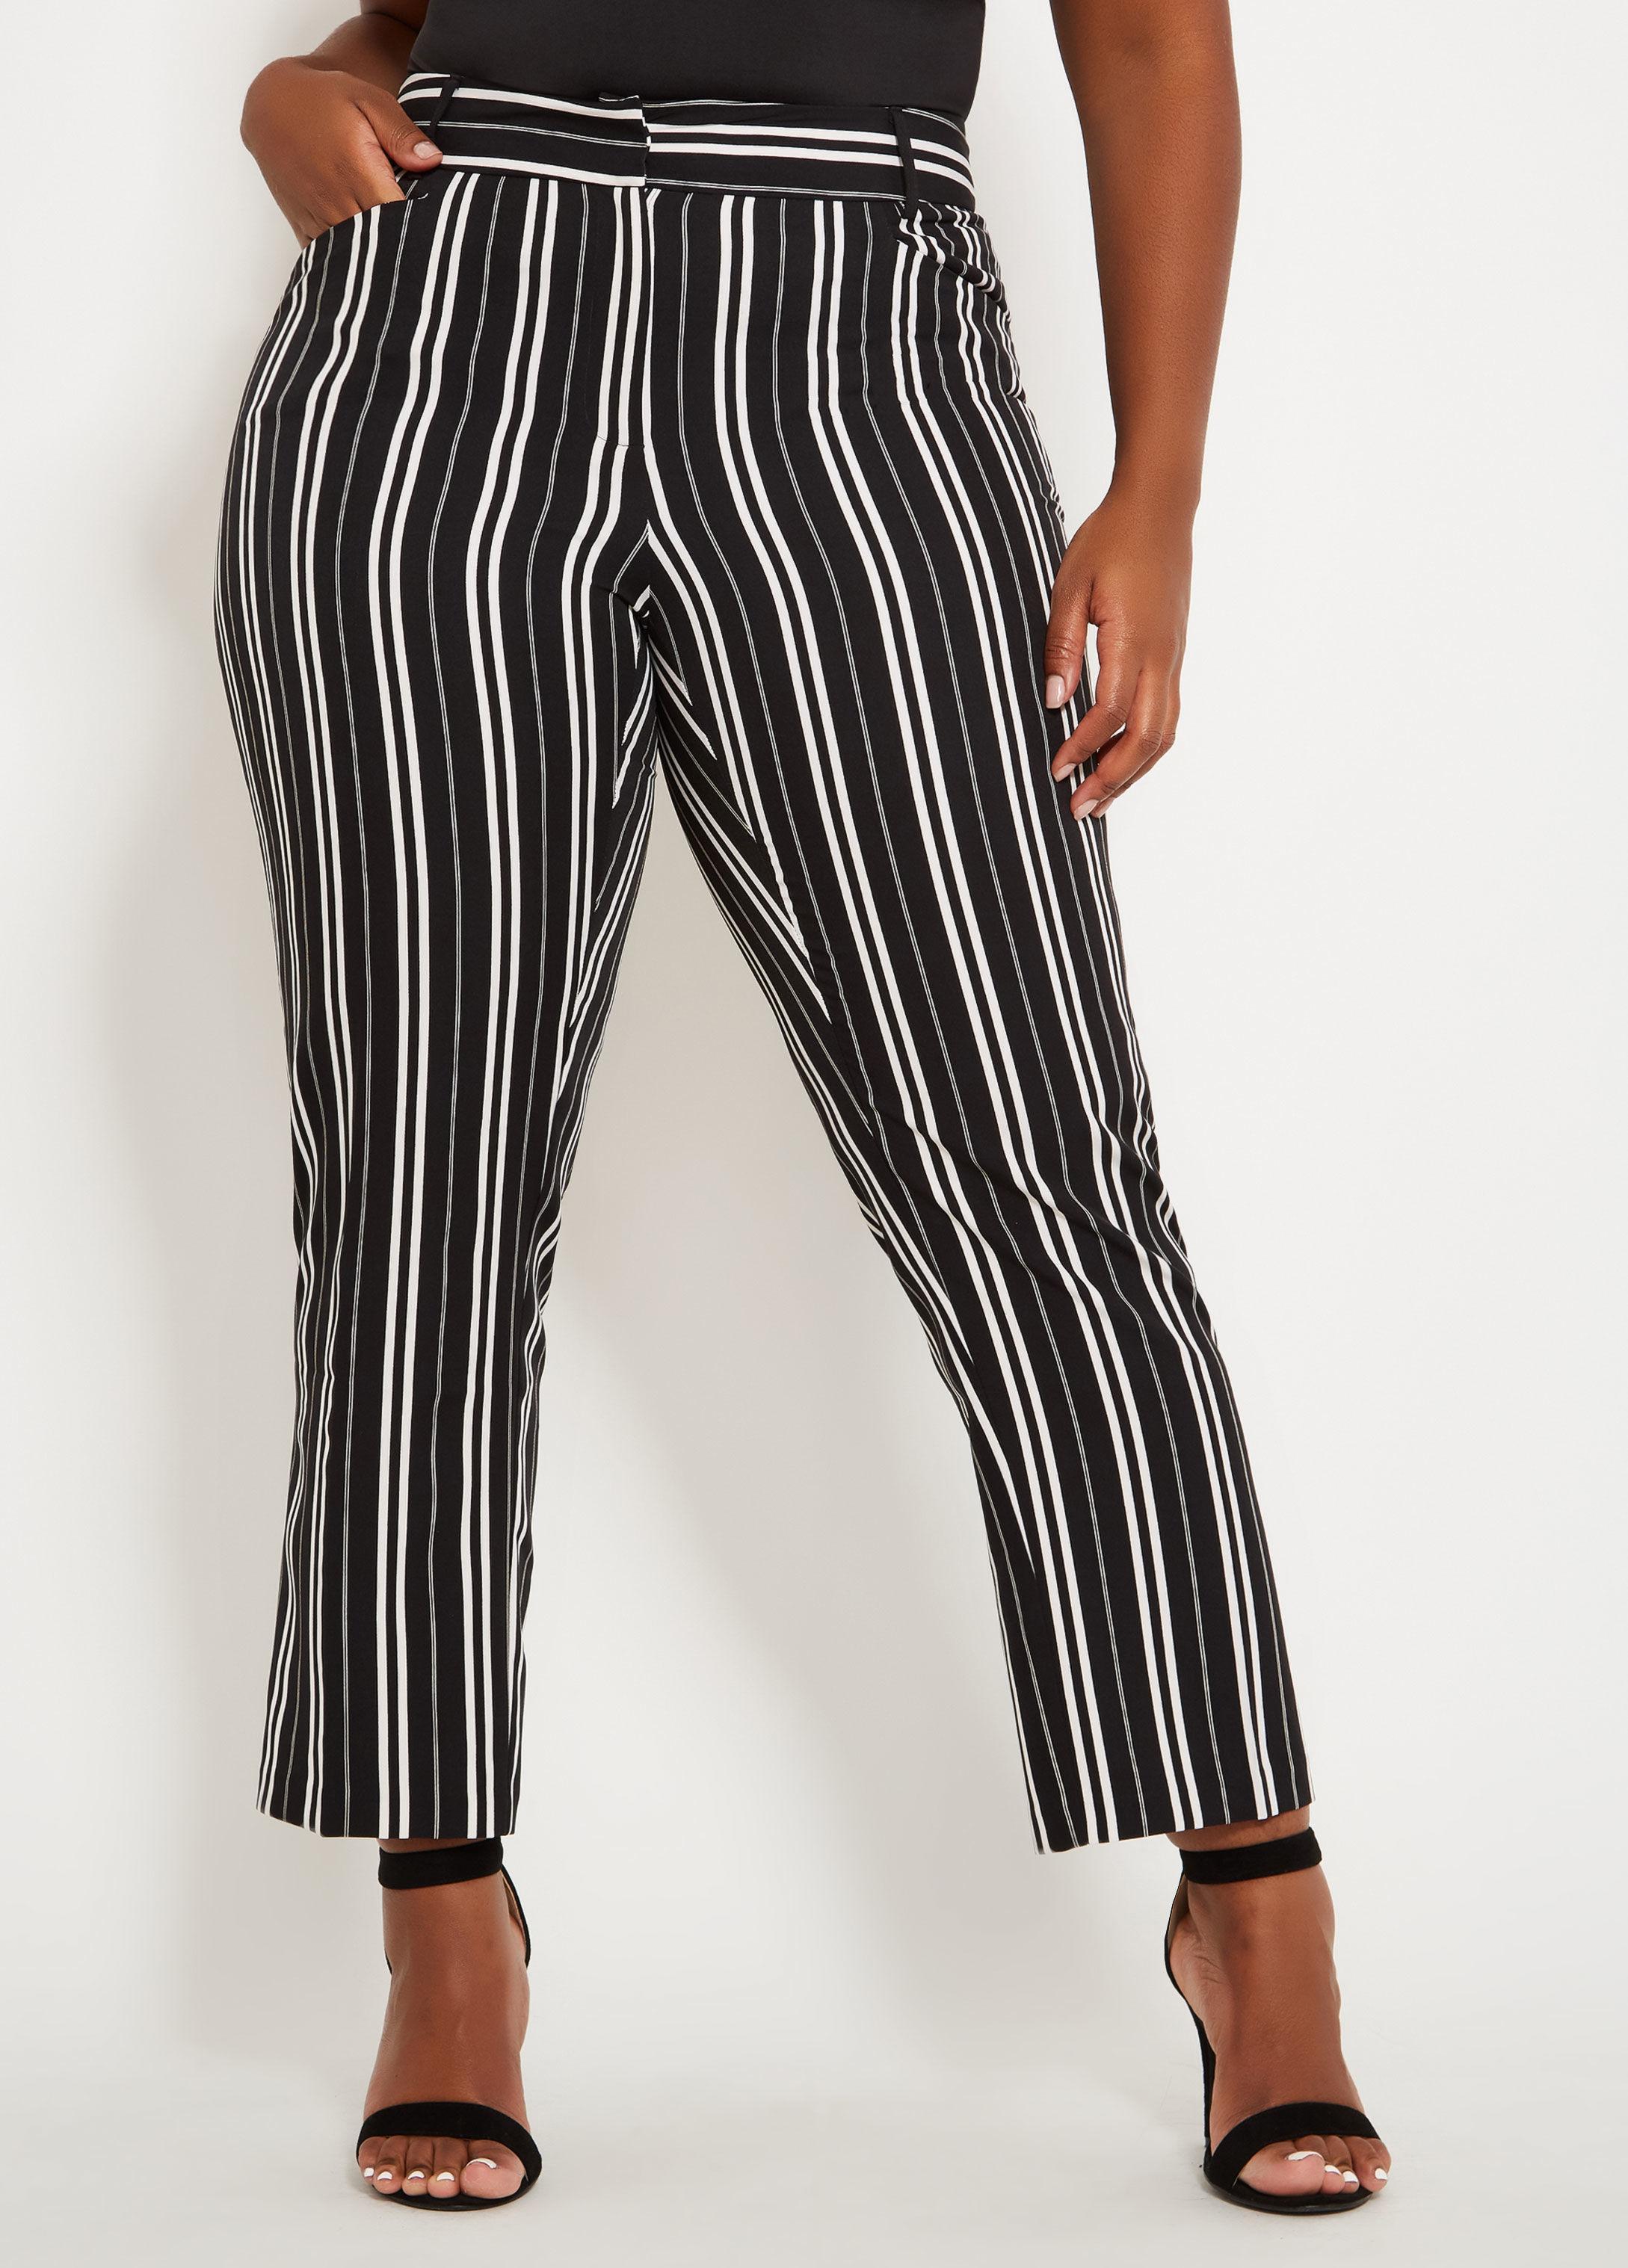 08050ba359718 Lyst - Ashley Stewart Plus Size Striped Ankle Pant in Black